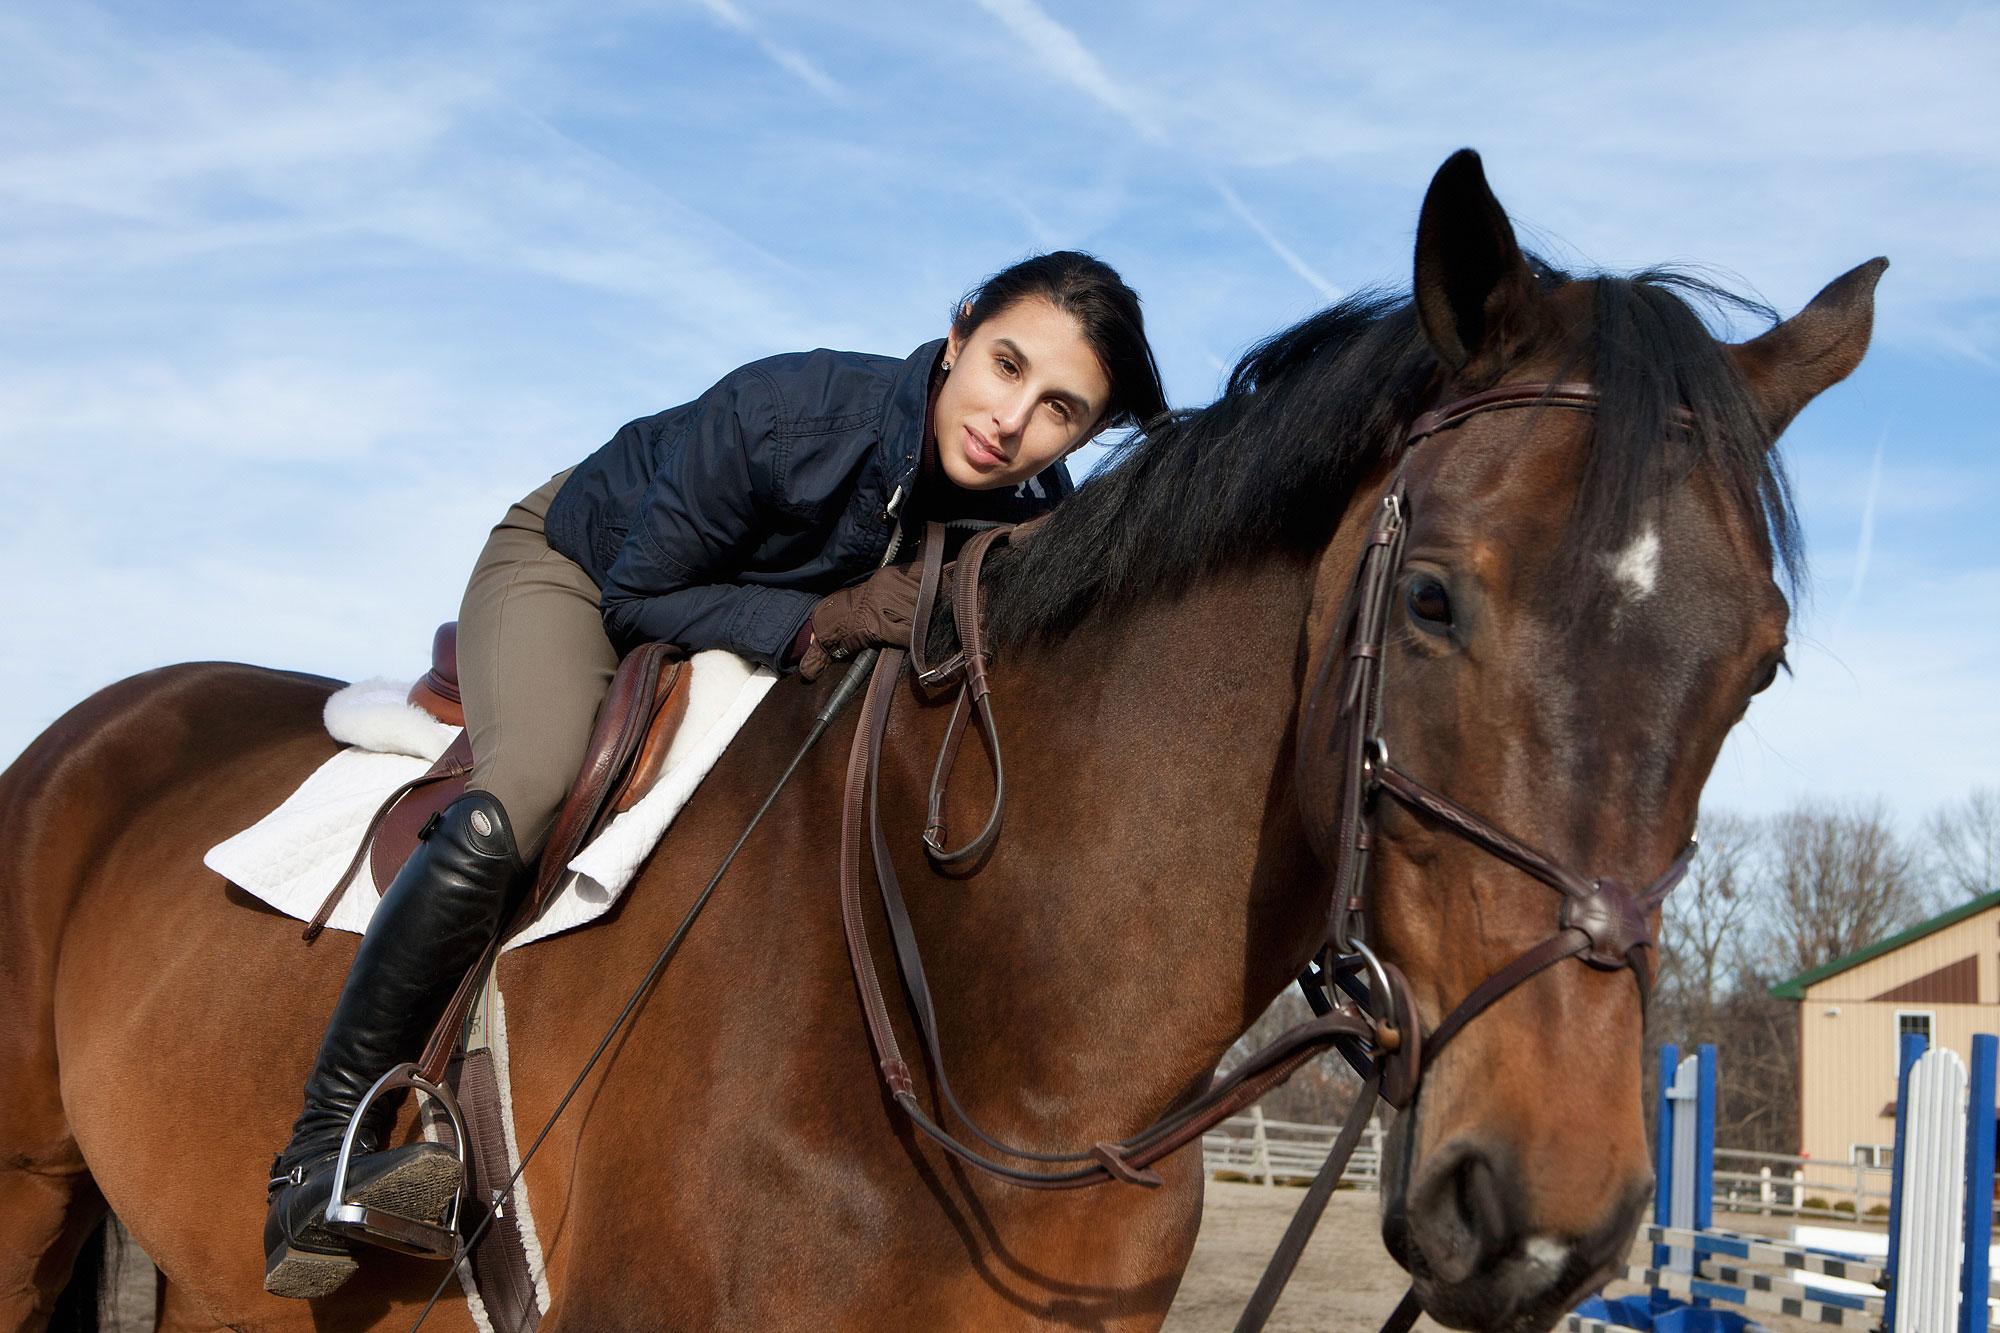 CareyKirkella_08_111119_Annabel_Horses_0675_web.jpg